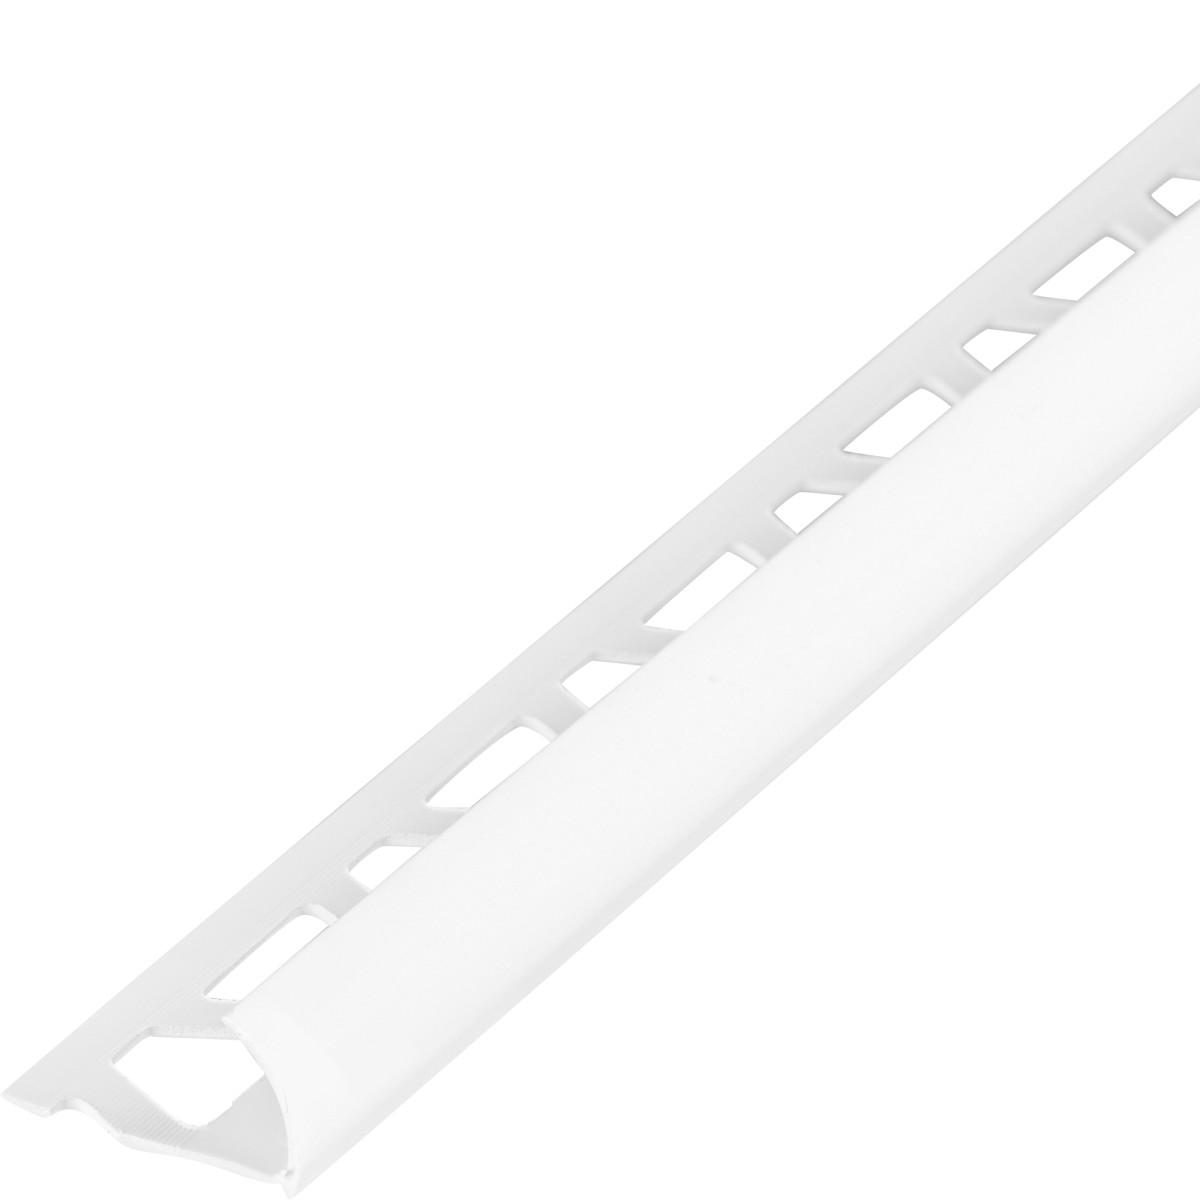 Профиль наружный глянцевый 10 мм цвет белый